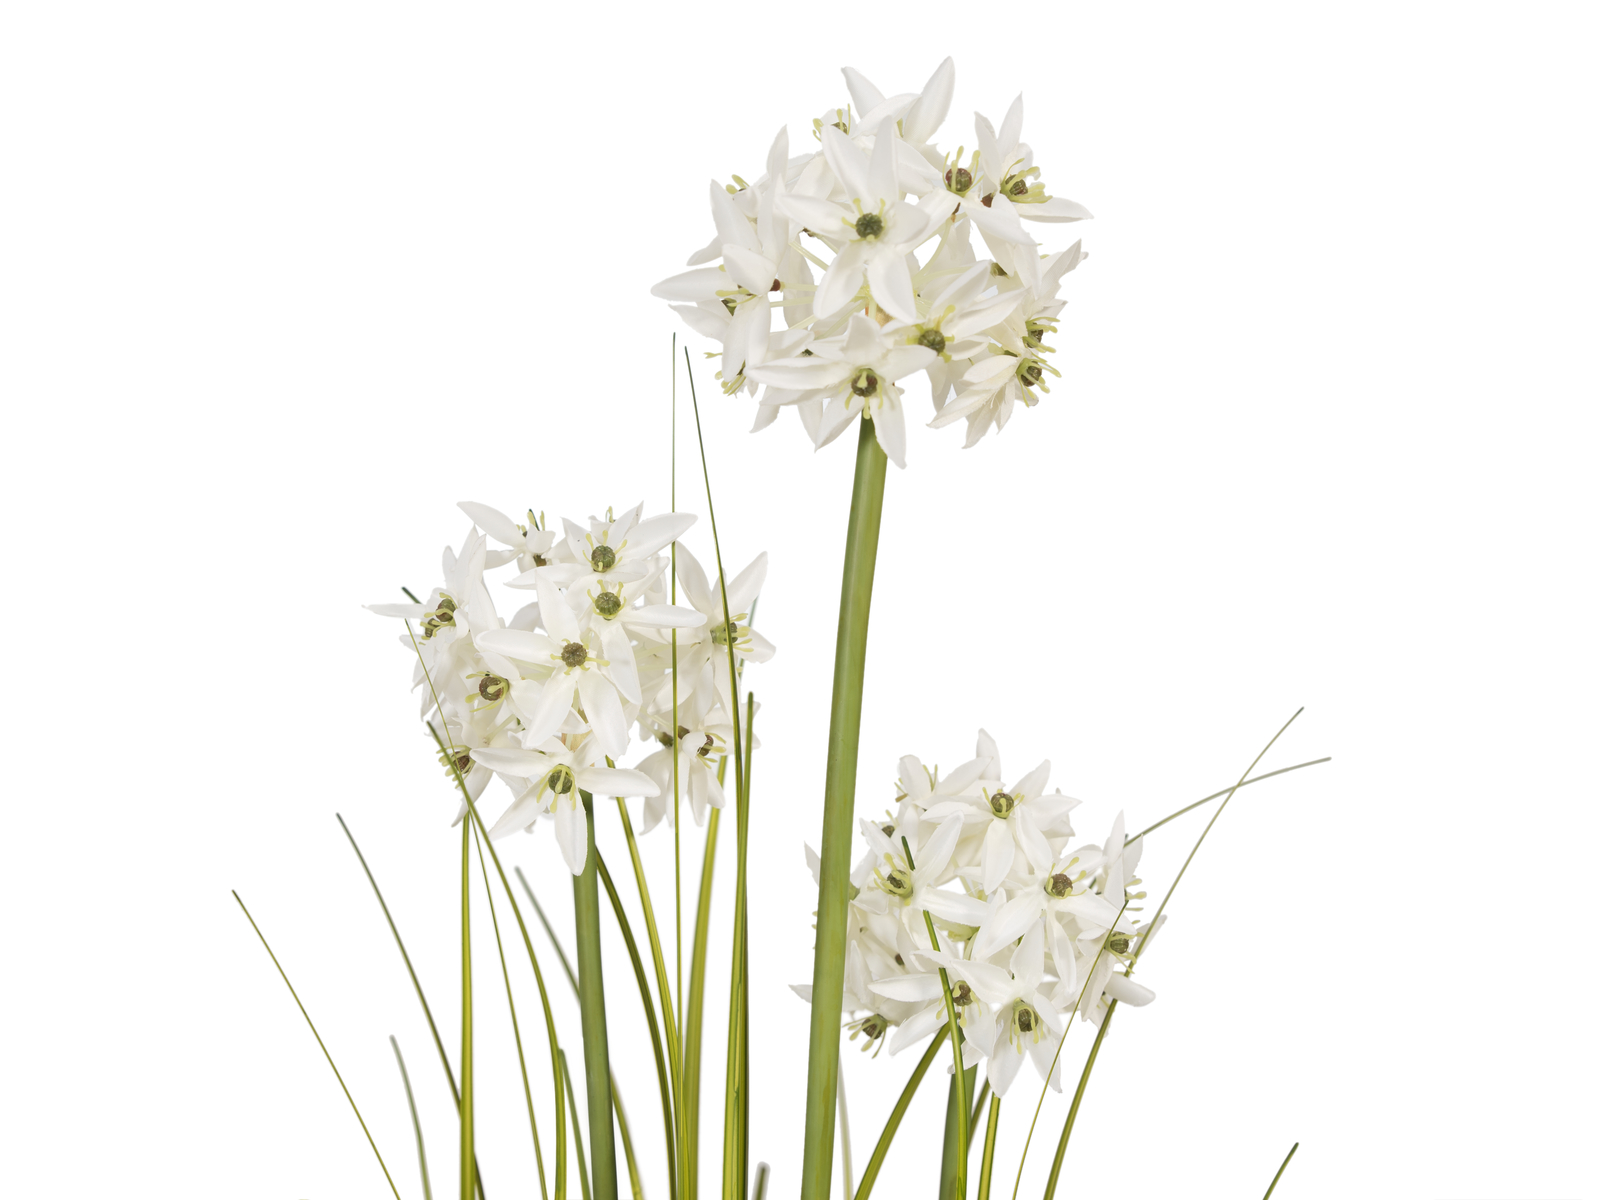 EUROPALMS Alliumgras, Kunstpflanze, weiß, 120 cm